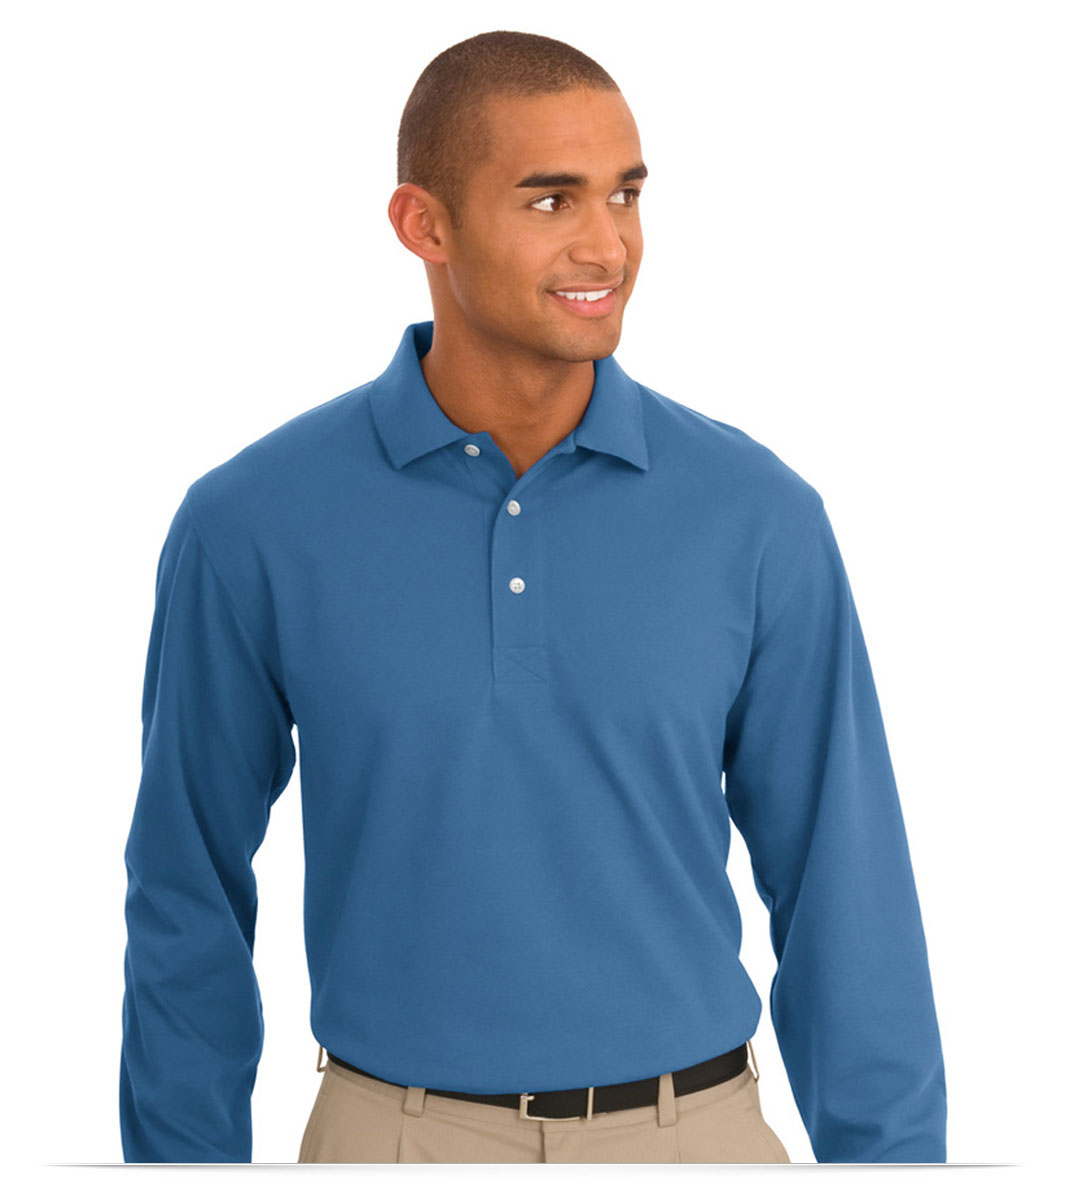 Design embroidered custom logo long sleeve sport shirt online for Embroidered work shirts no minimum order